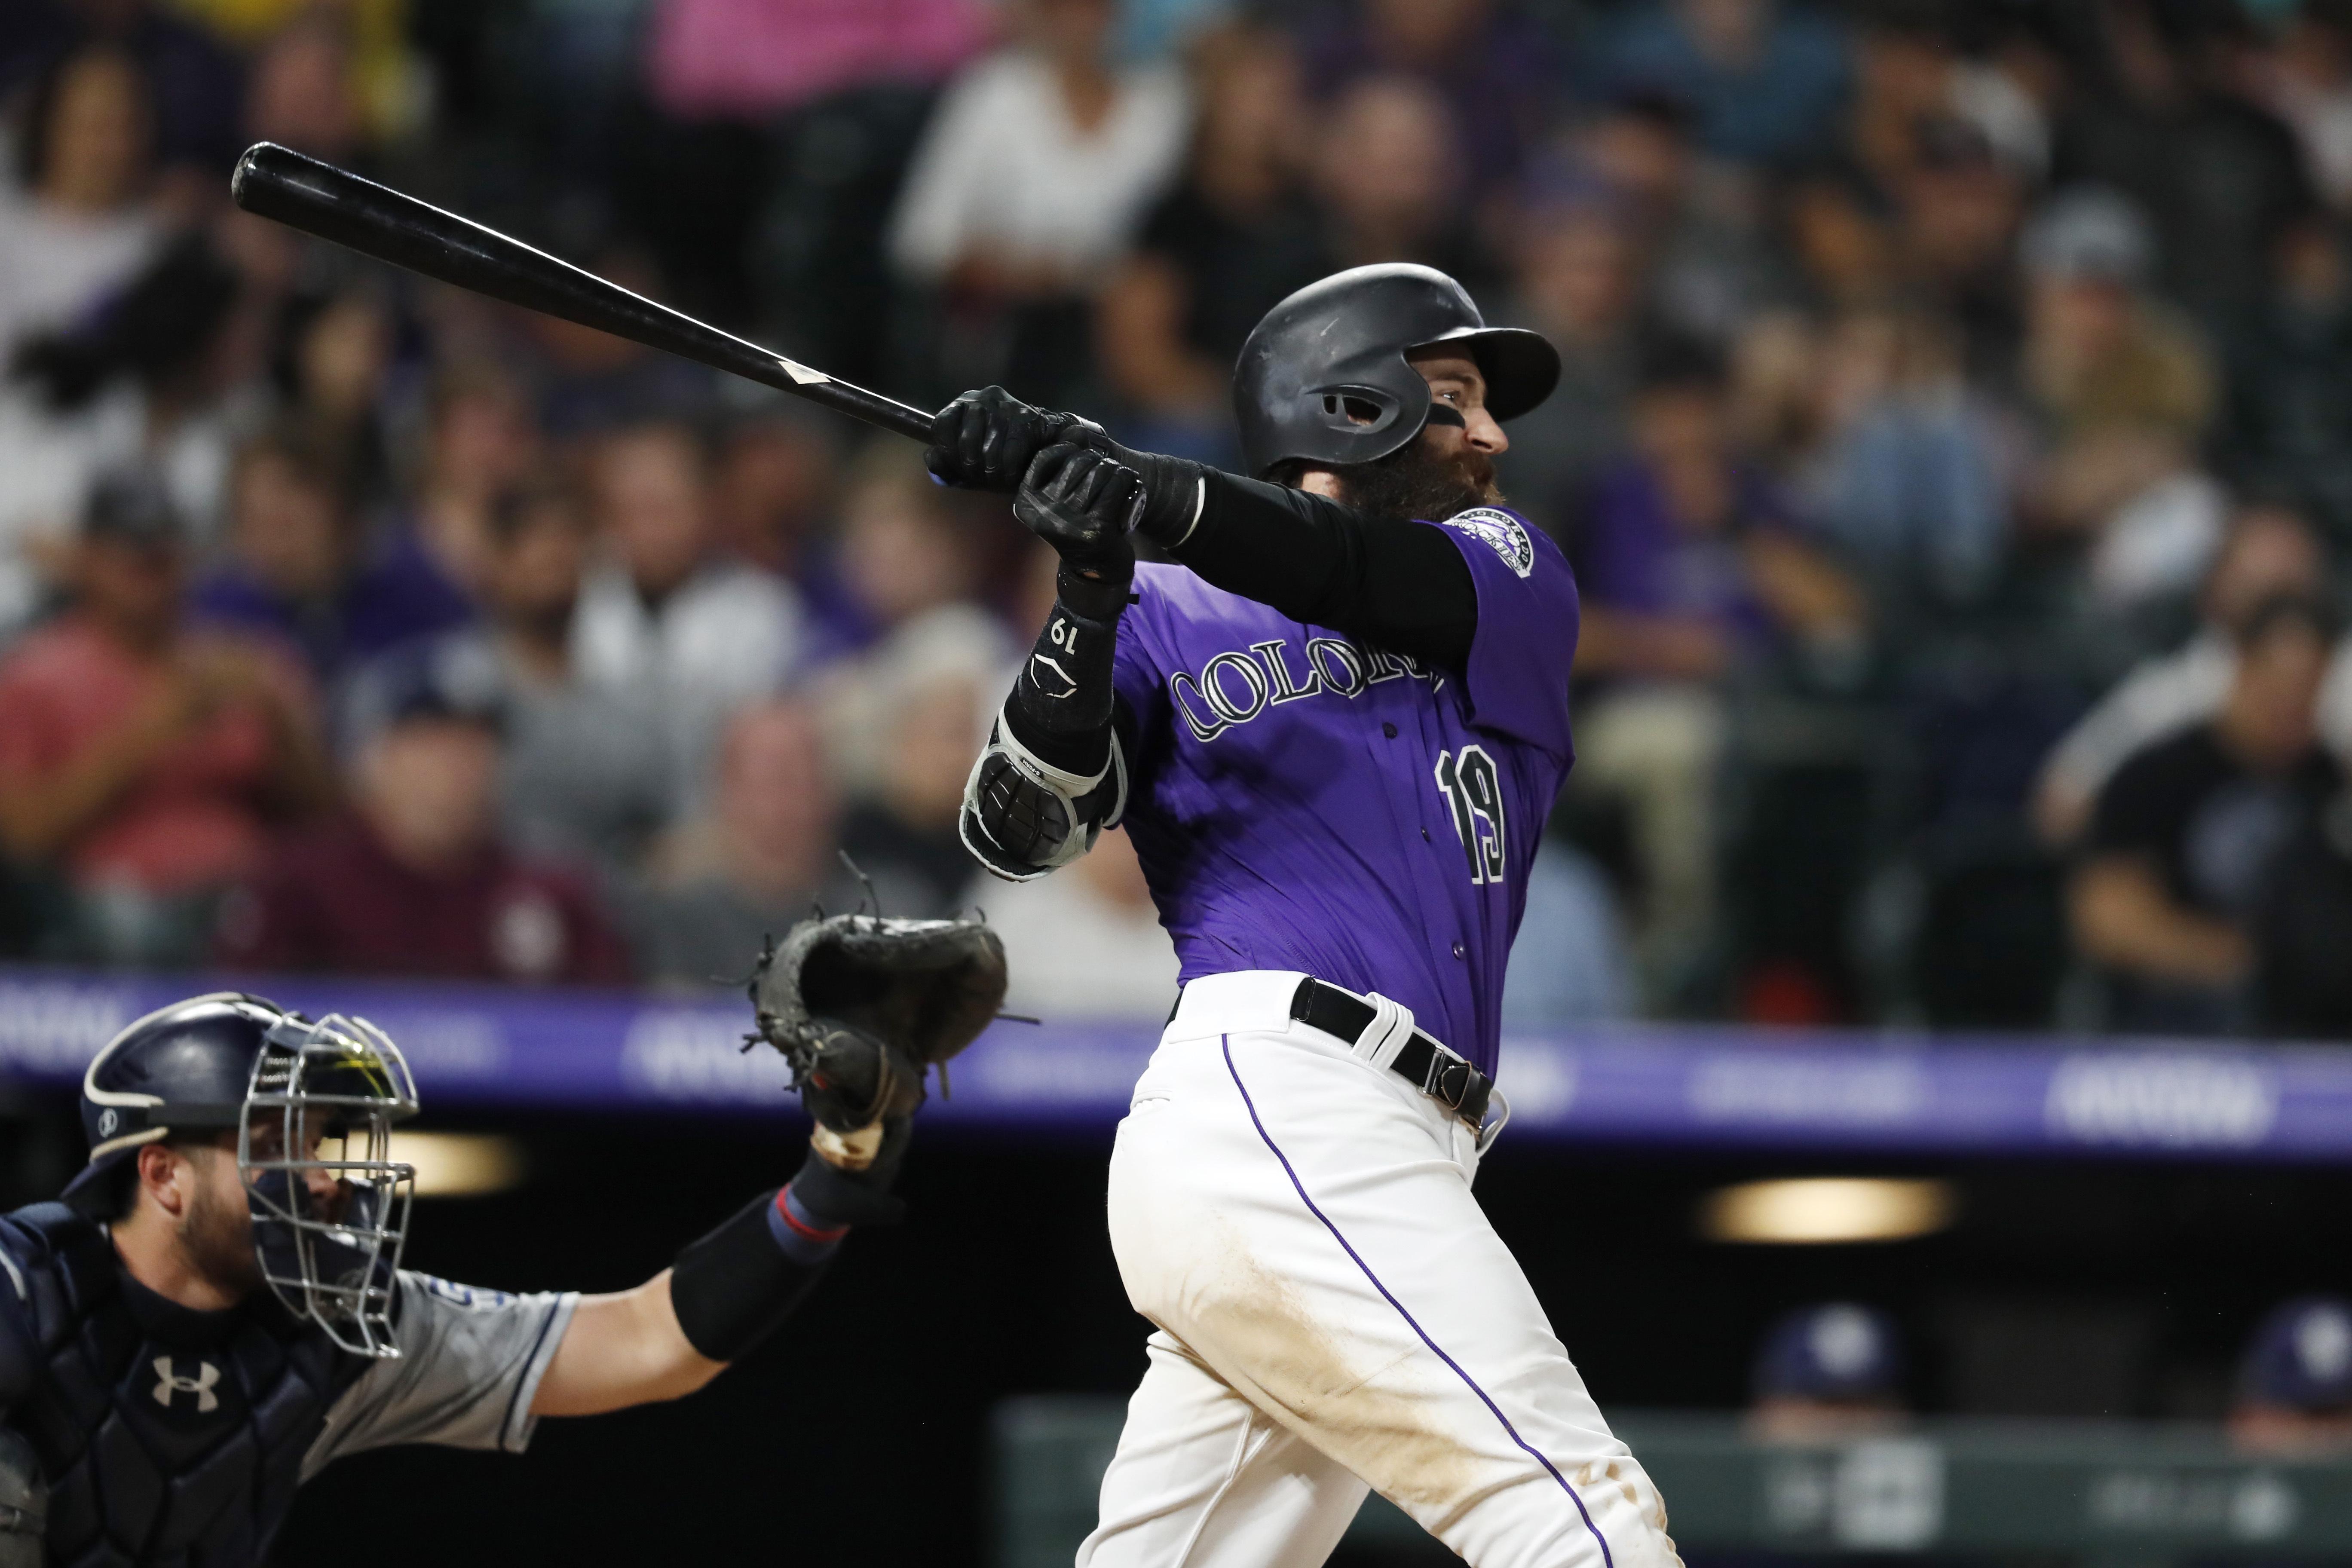 Blackmon hits 2 HRs, Gray Ks 10 as Rockies beat Padres 9-6